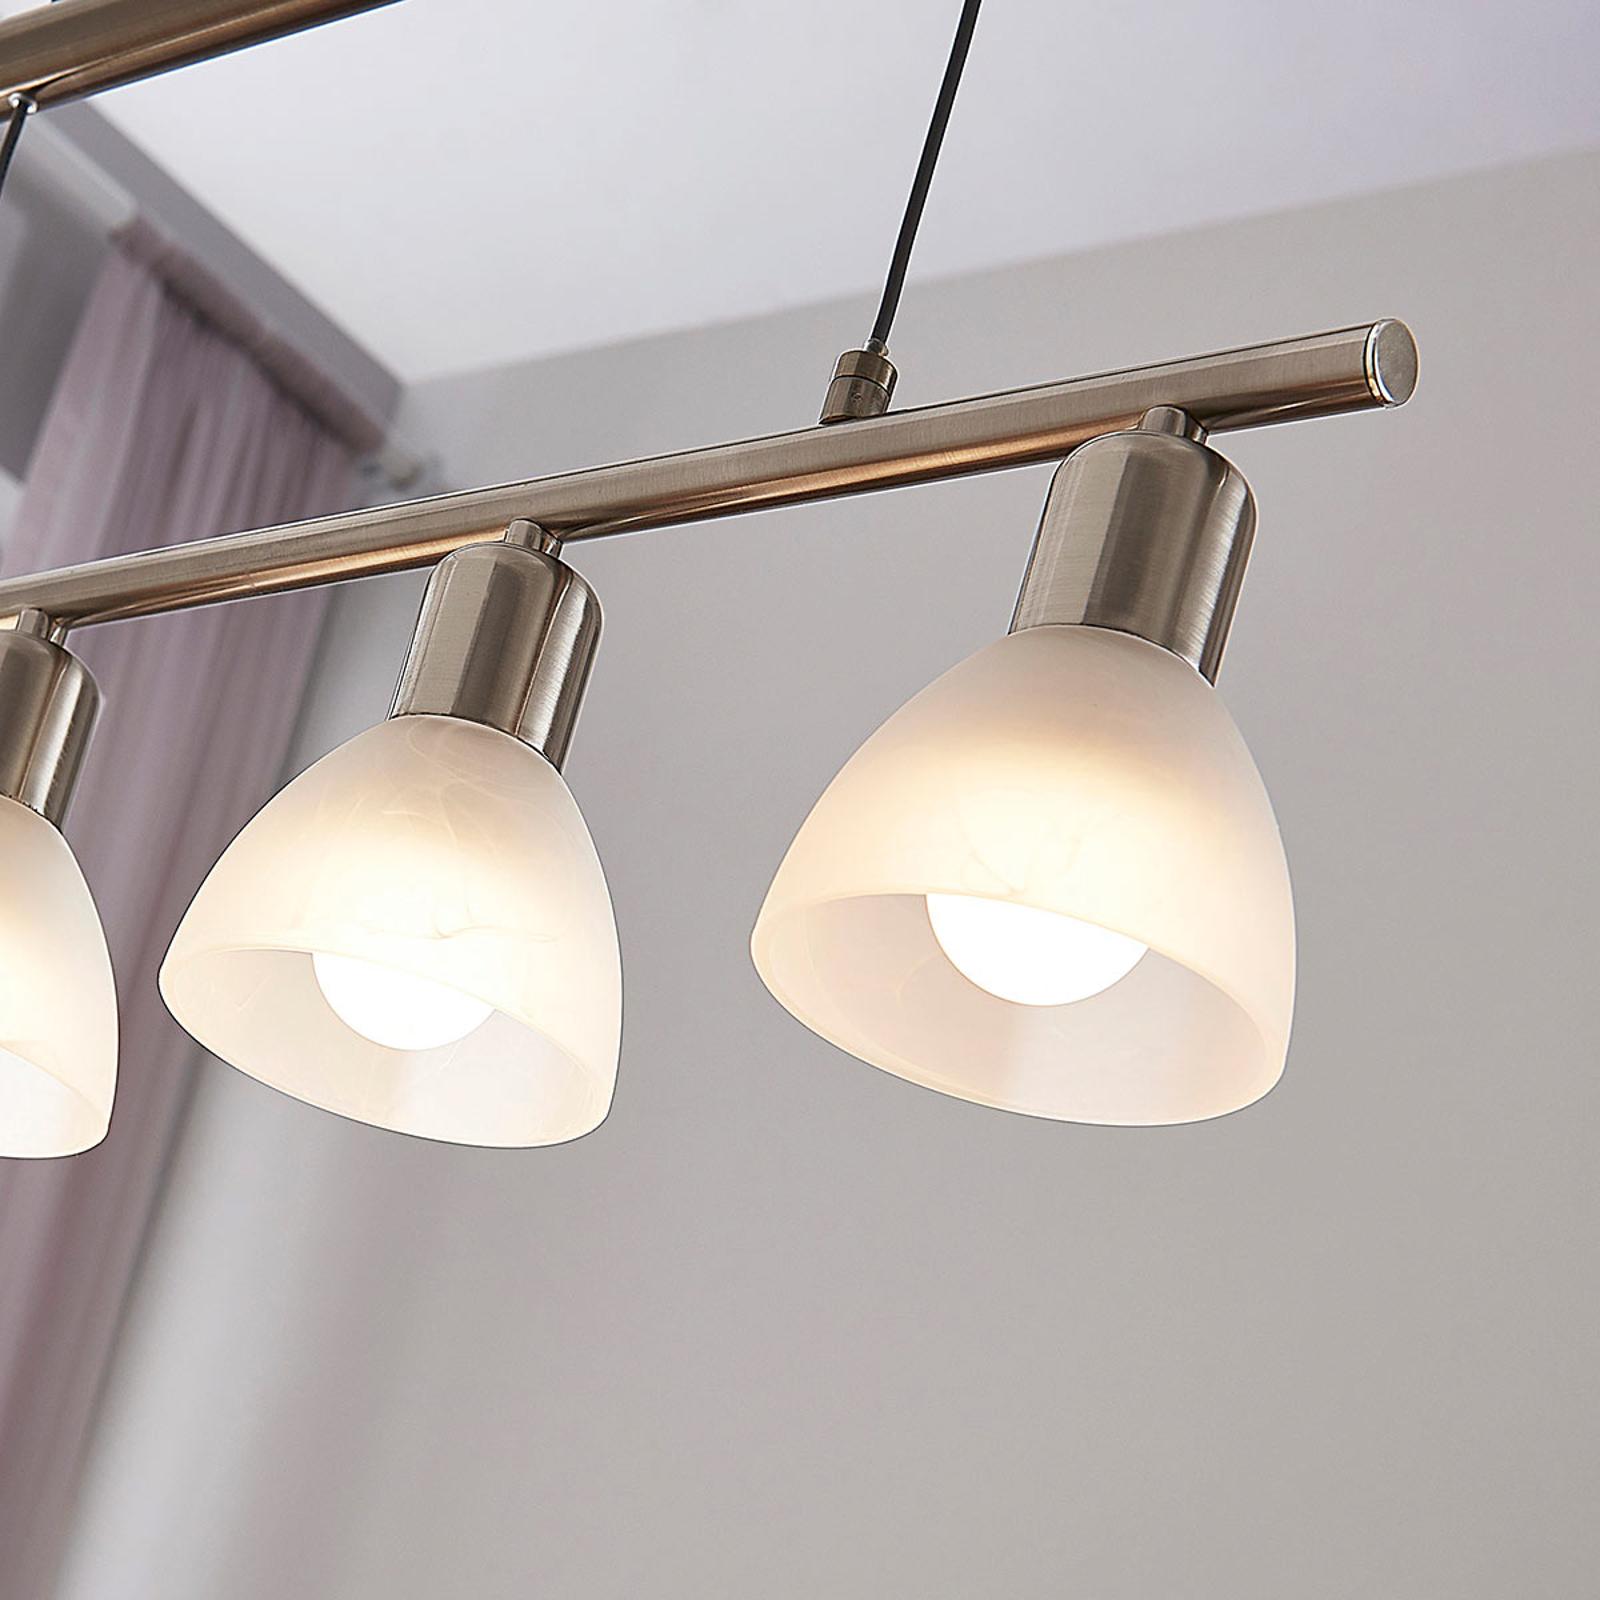 Høydejusterbar LED pendellampe Gwendolin, bjelke